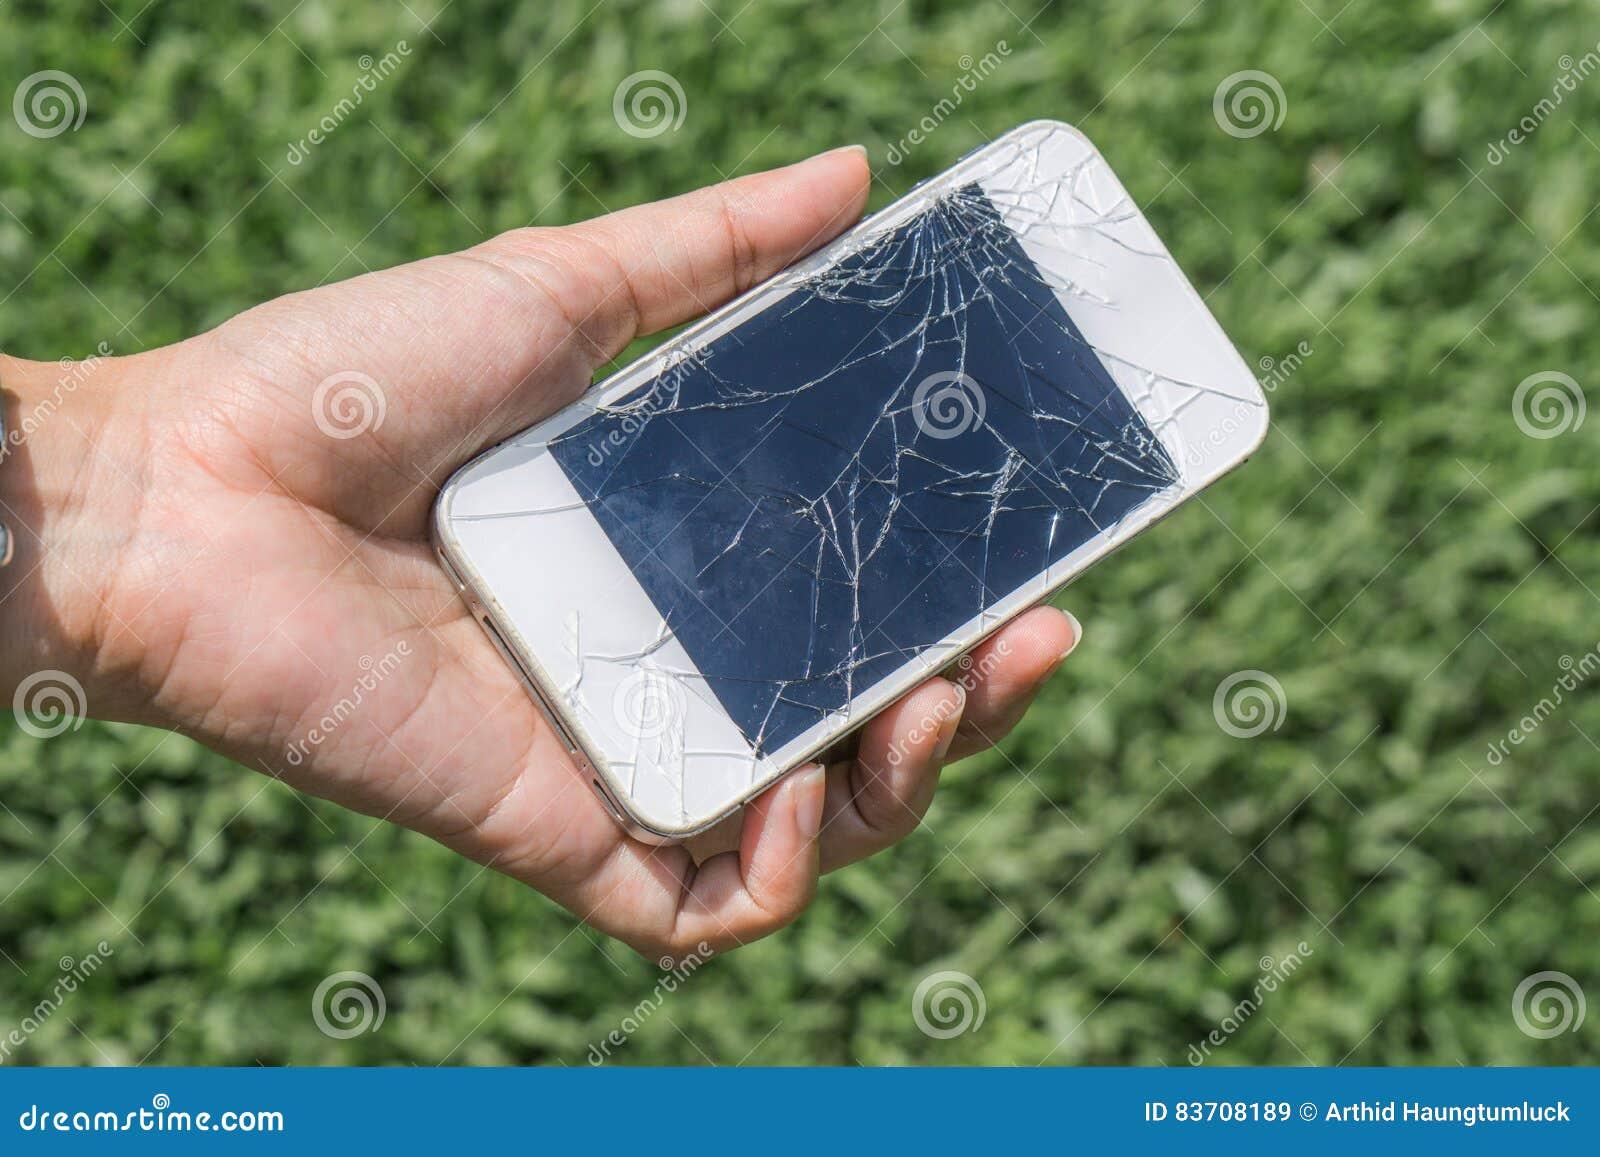 Hands Holding Broken Mobile Smartphone Stock Image - Image of defeat